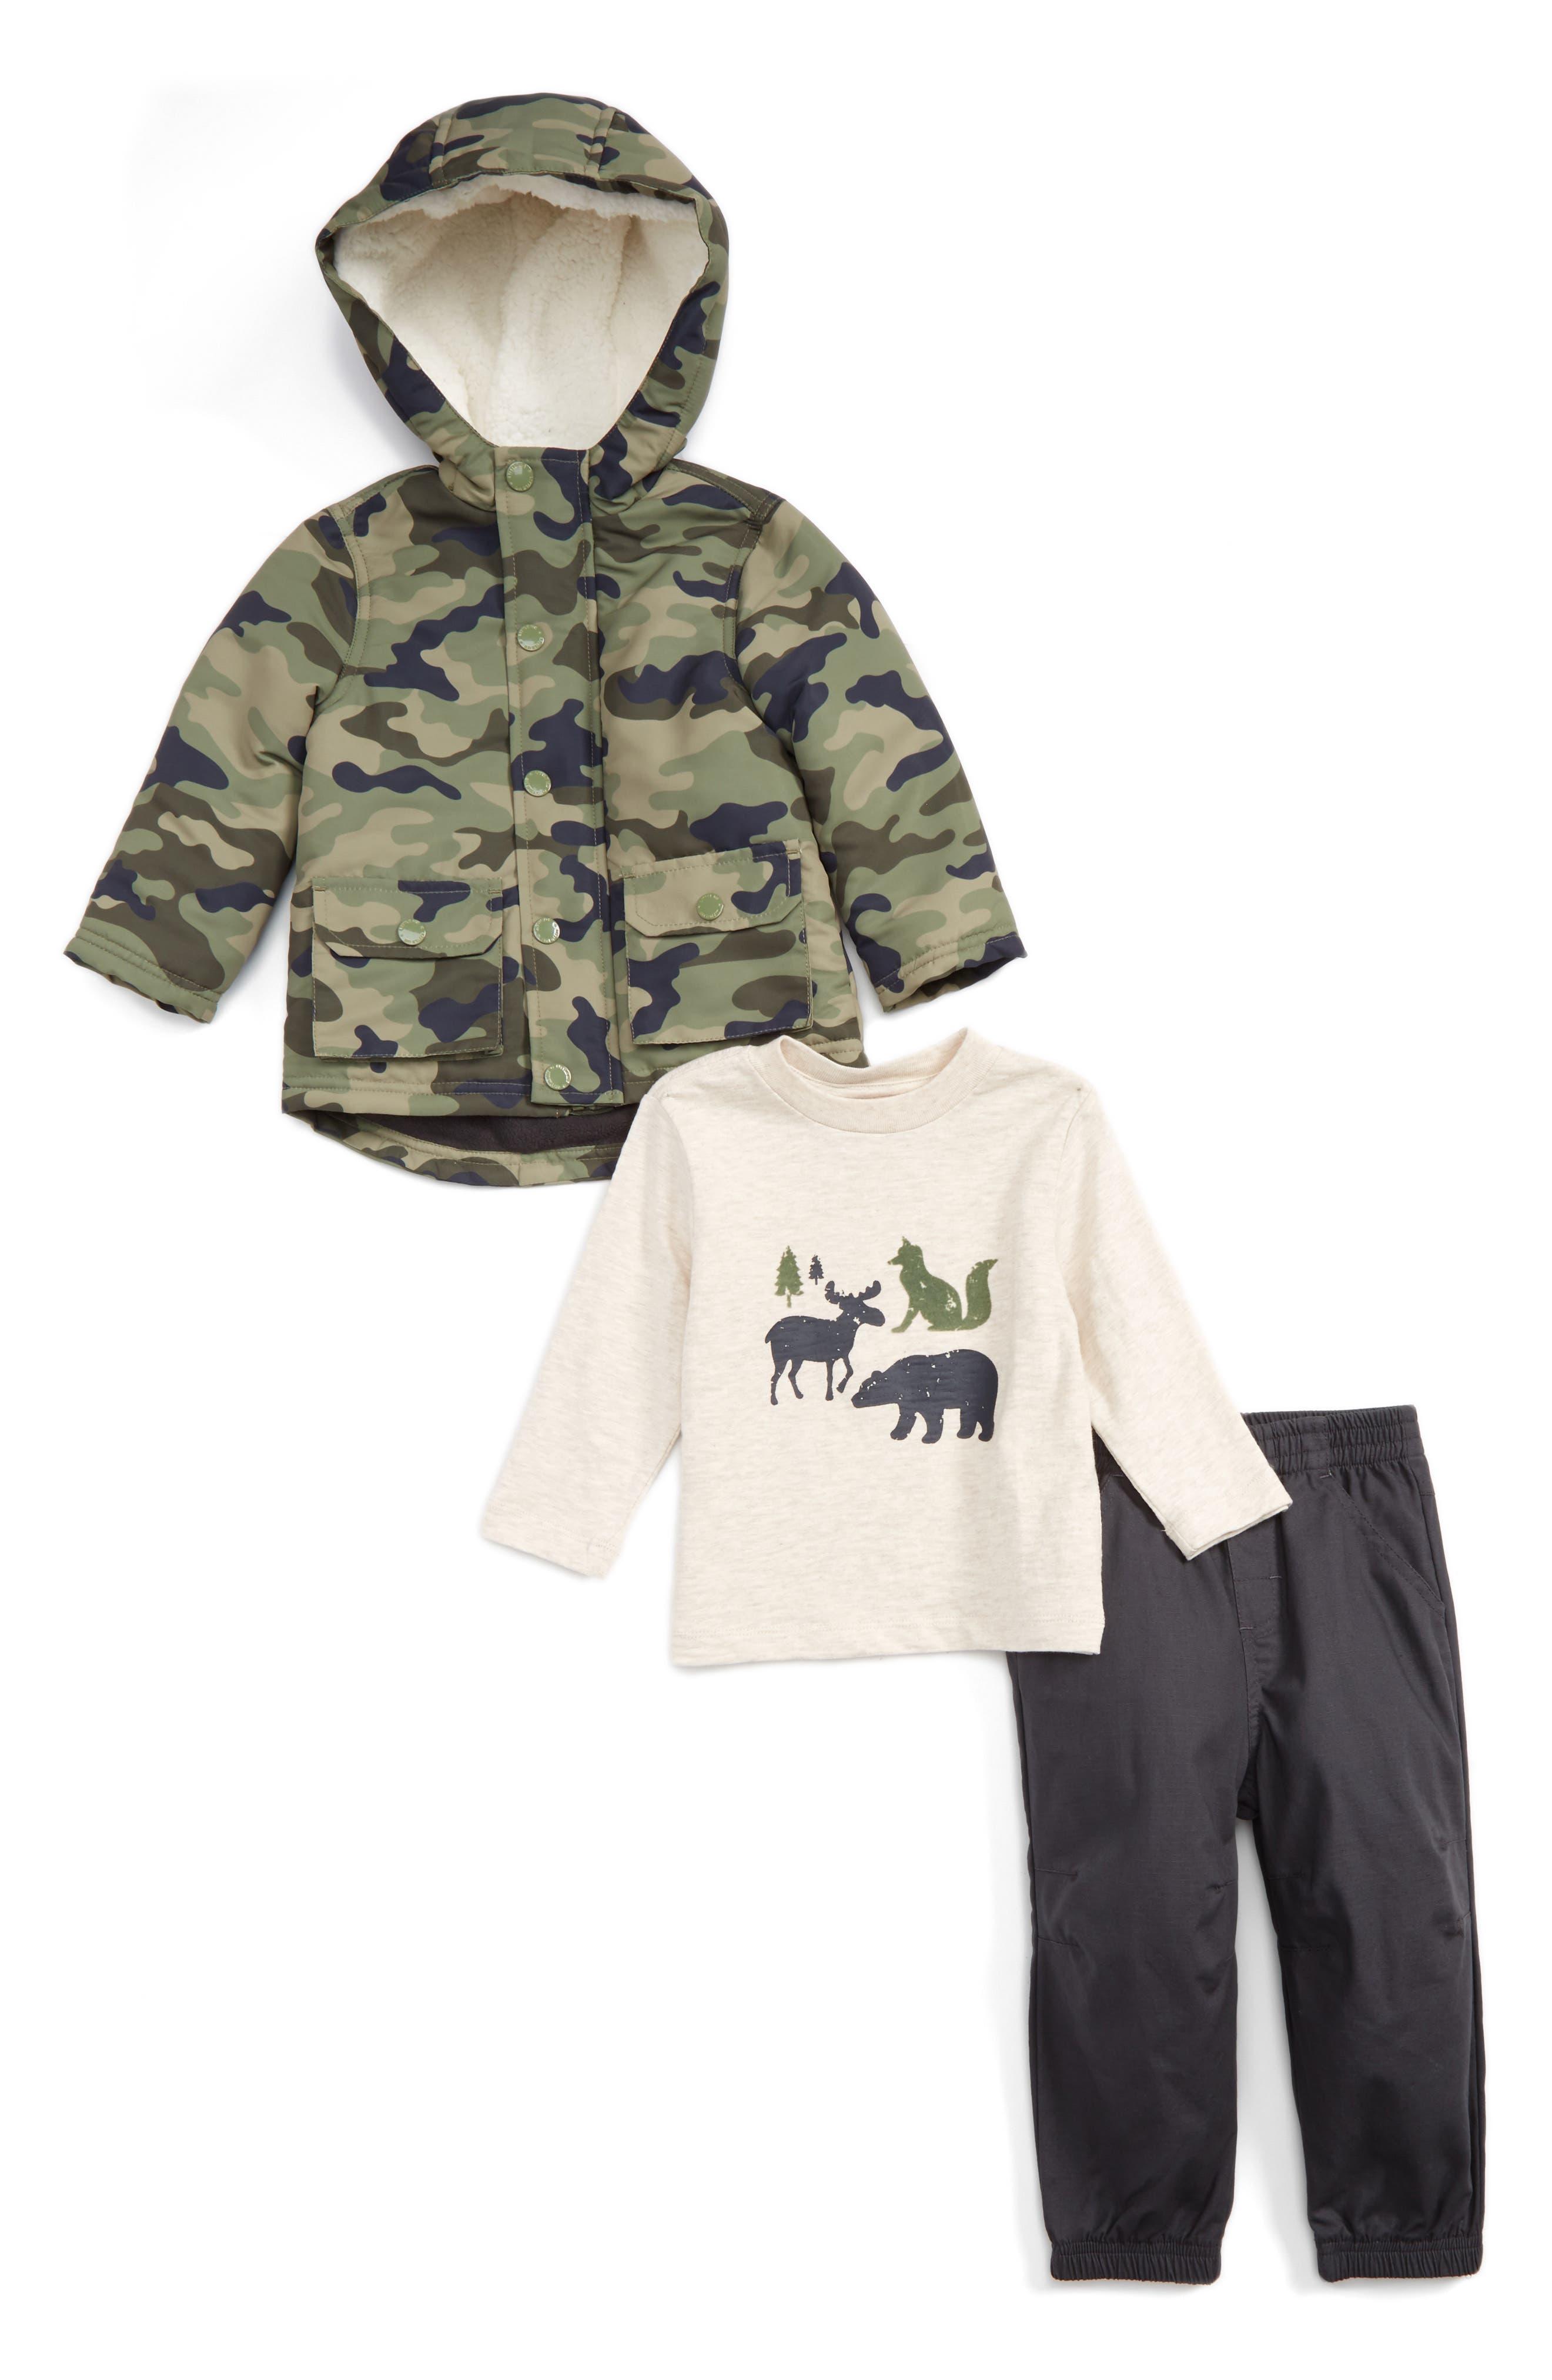 Alternate Image 1 Selected - Little Me Camo Hooded Jacket, T-Shirt & Pants Set (Baby Boys)